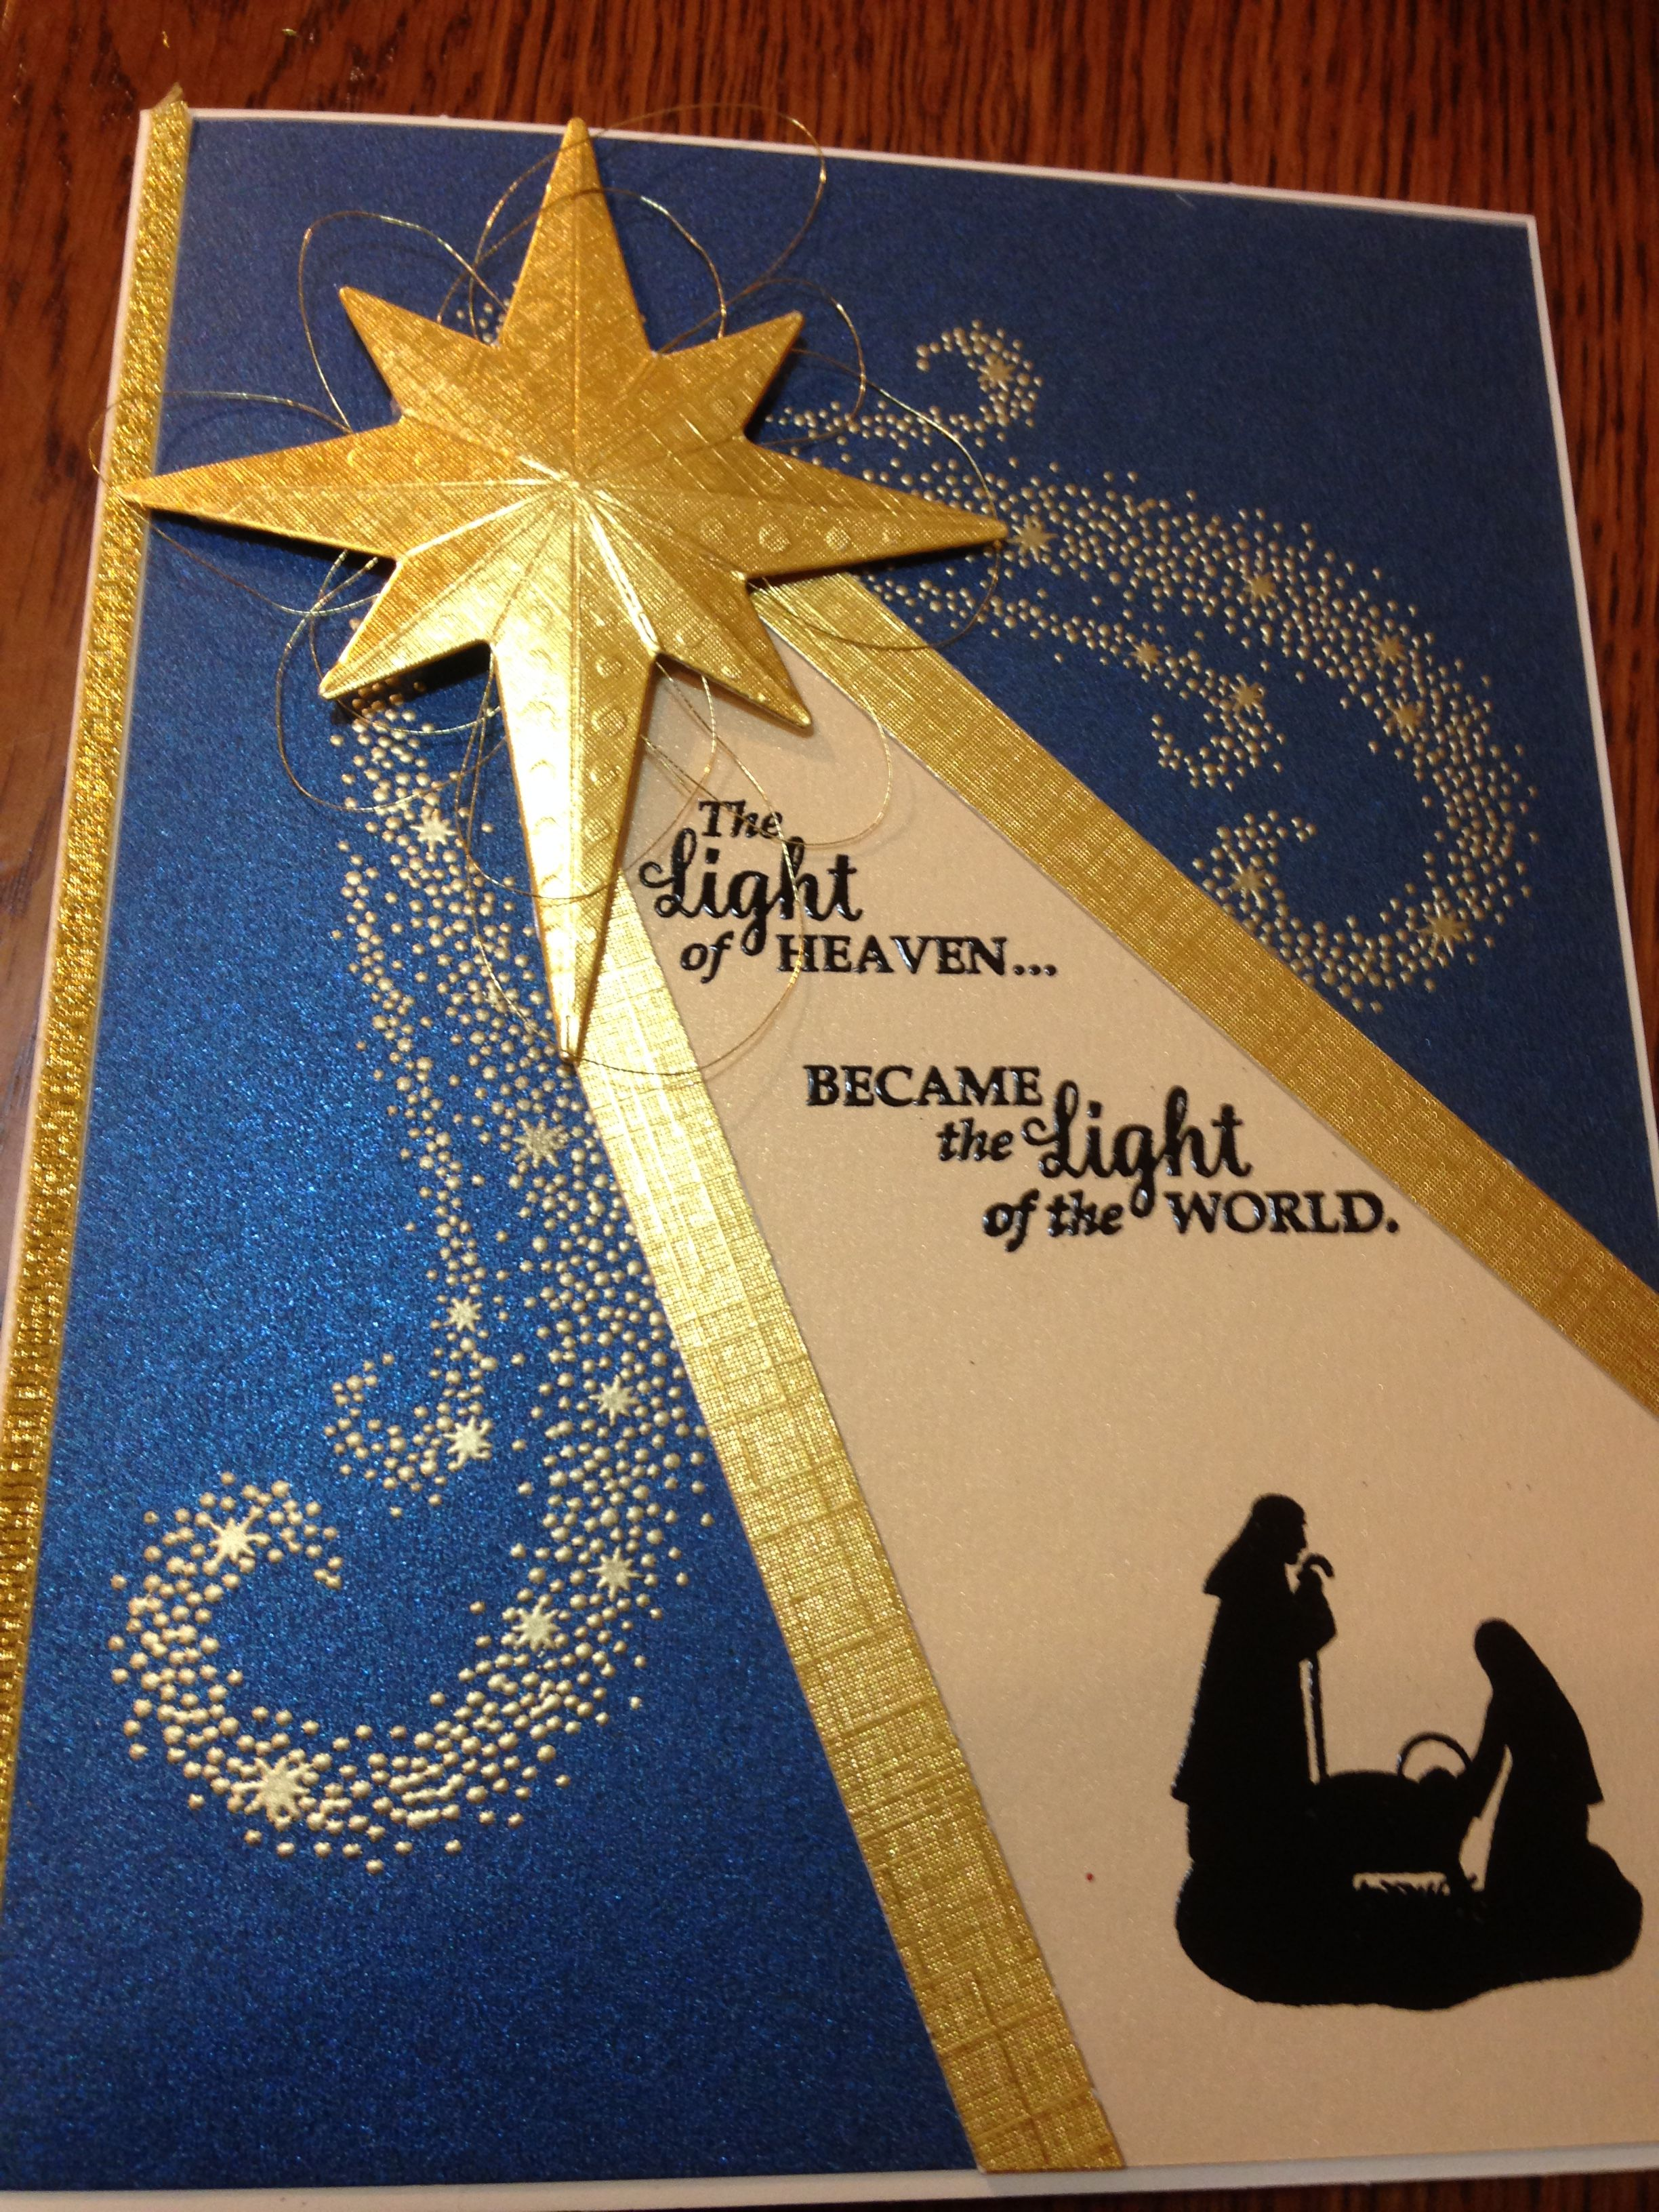 Pin de yolis en peri dico mural tarjetas de navidad - Tarjetas navidenas cristianas ...